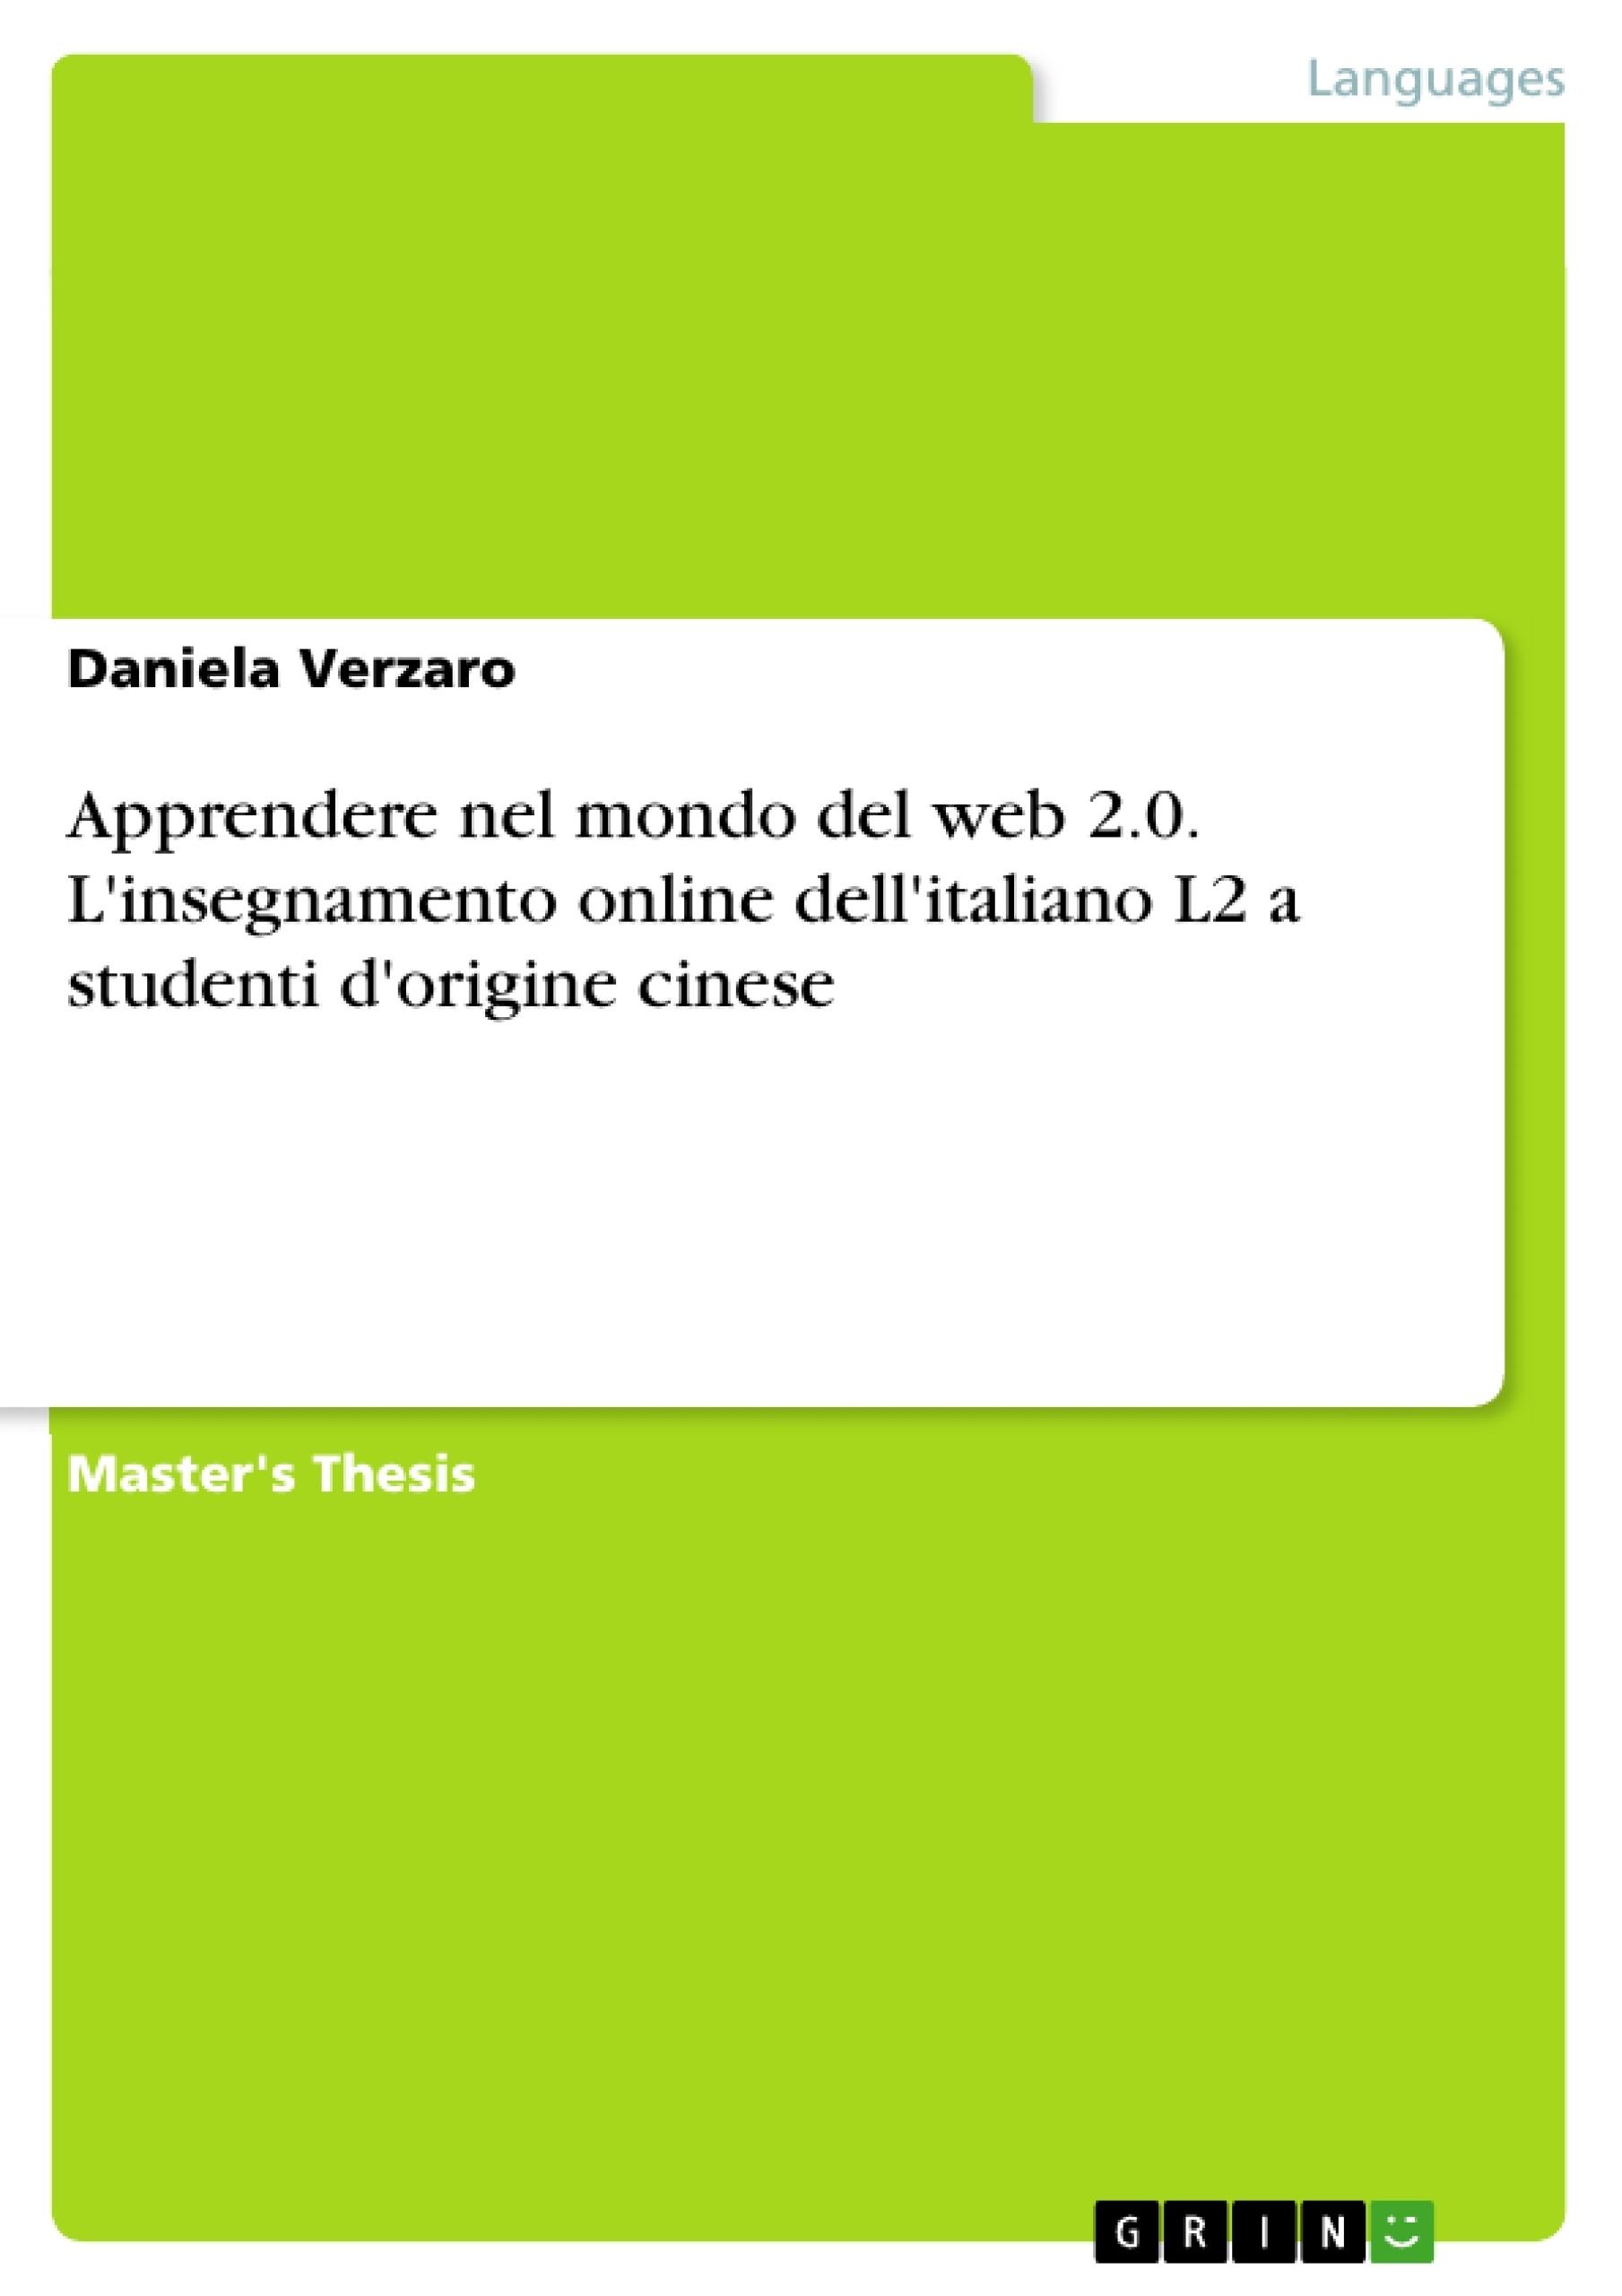 Web 2.0 dissertation